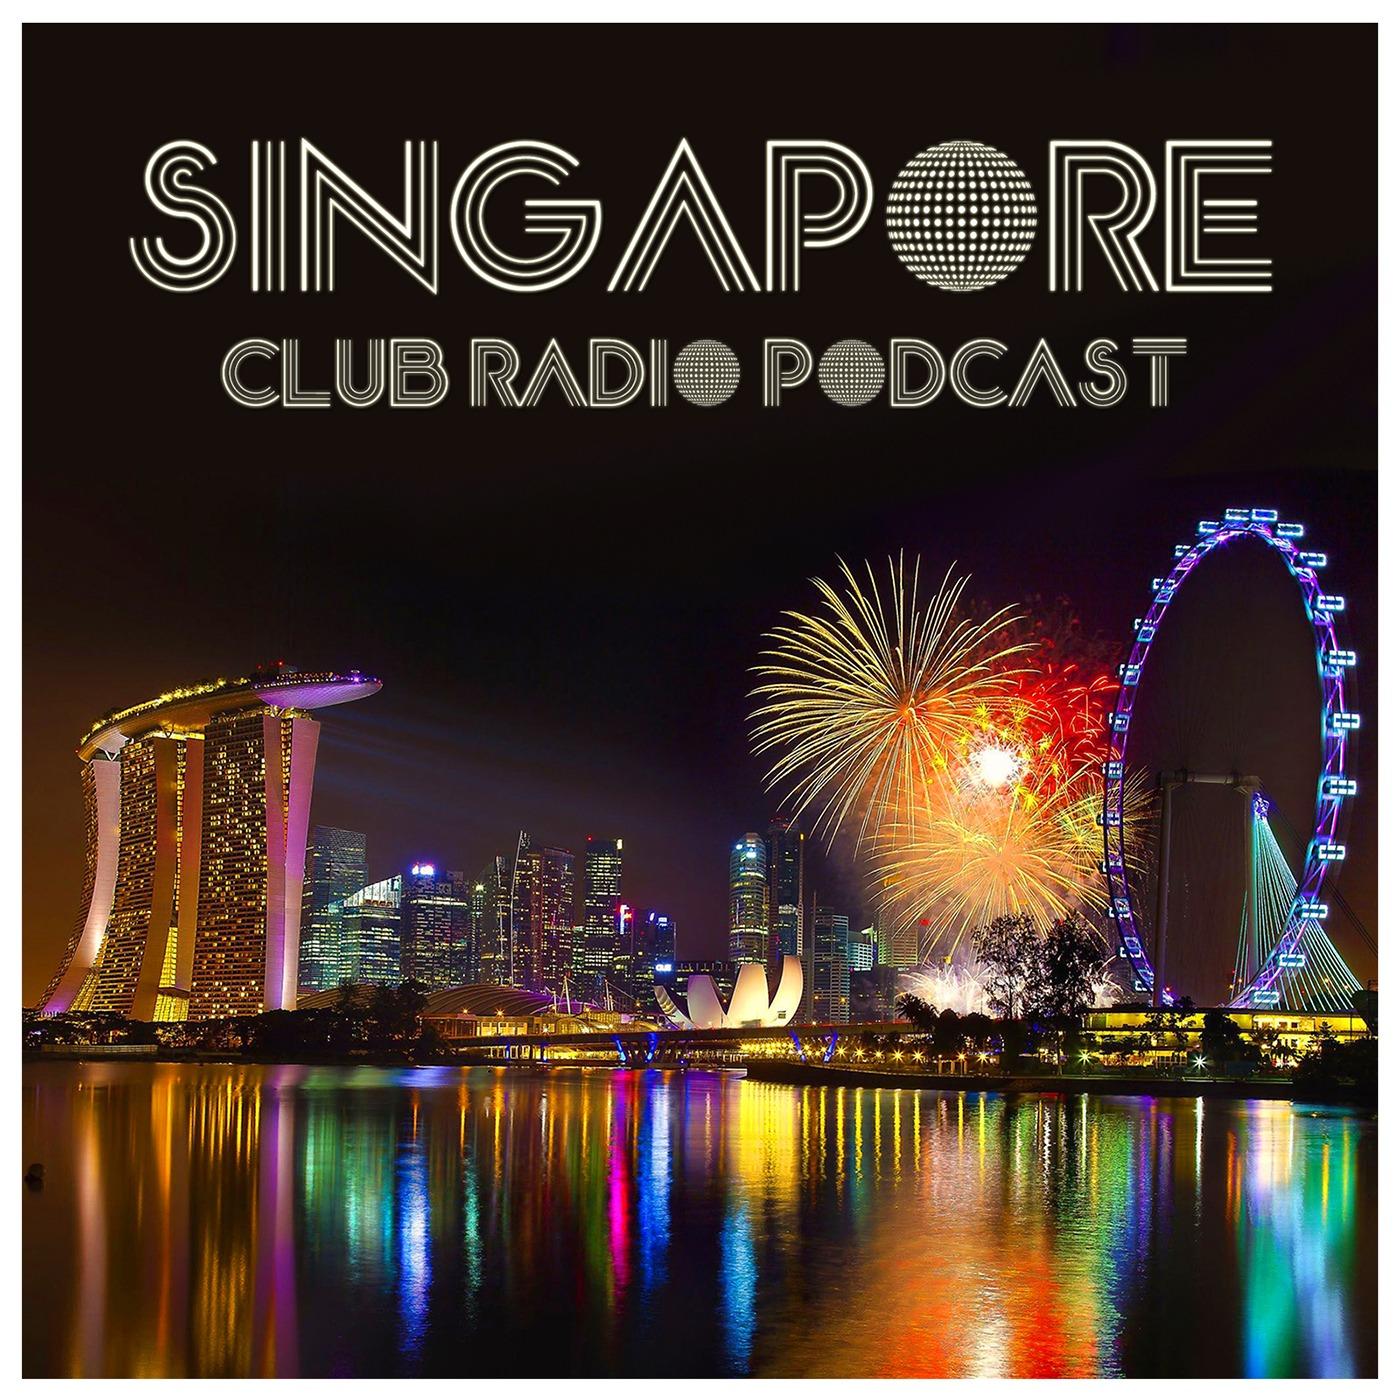 Singapore Club Radio - DJ Mixes